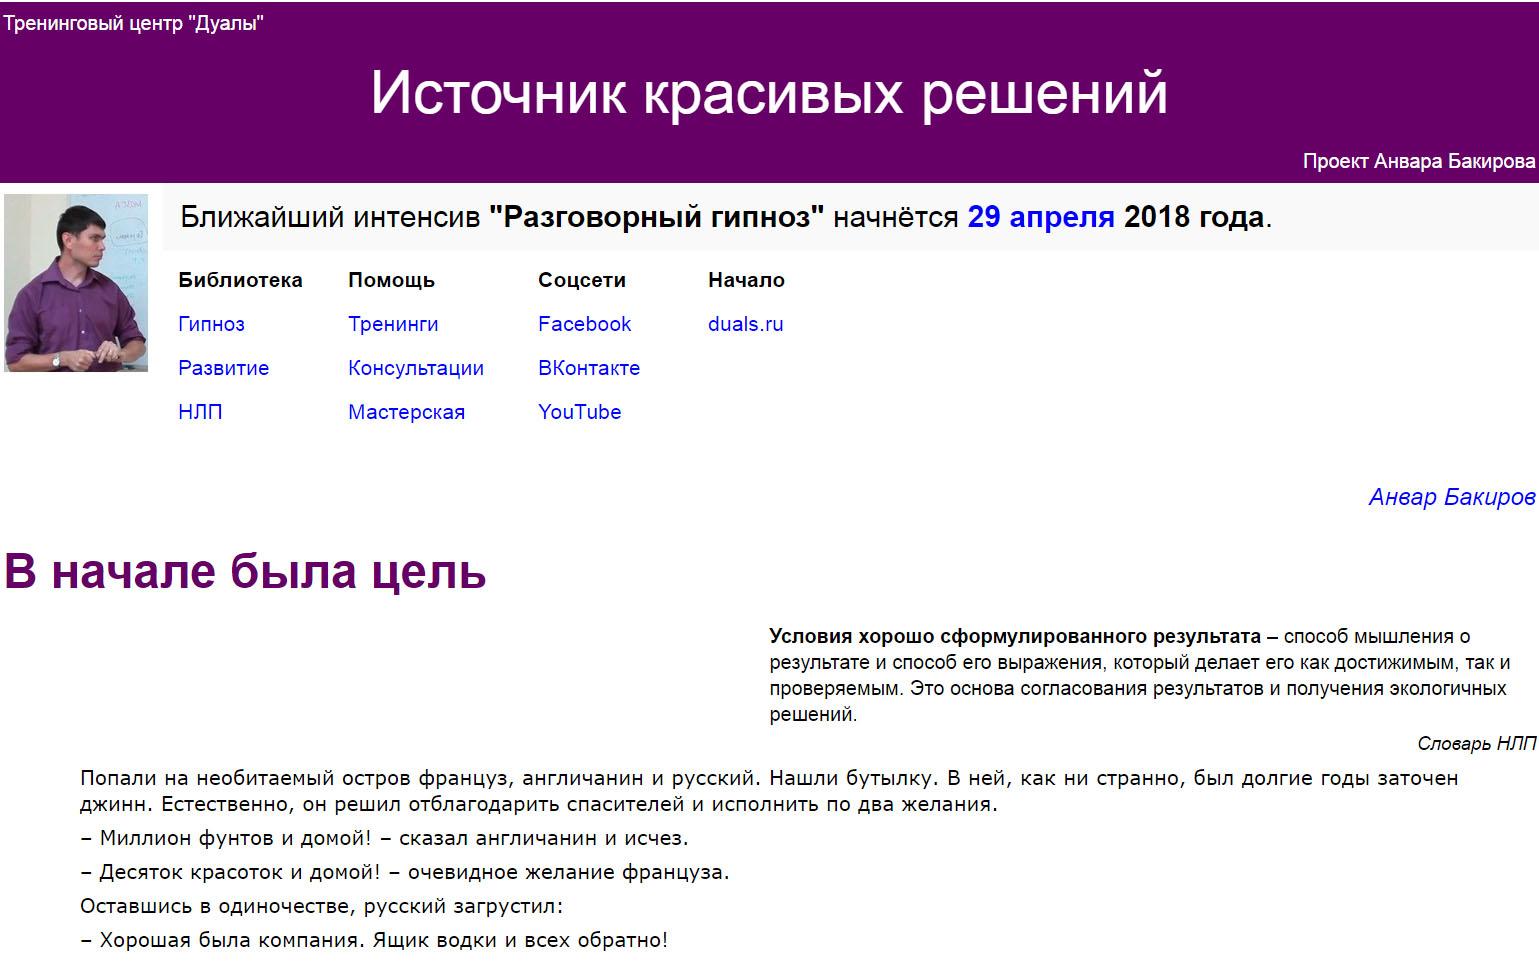 сайт Анвара Бакирова